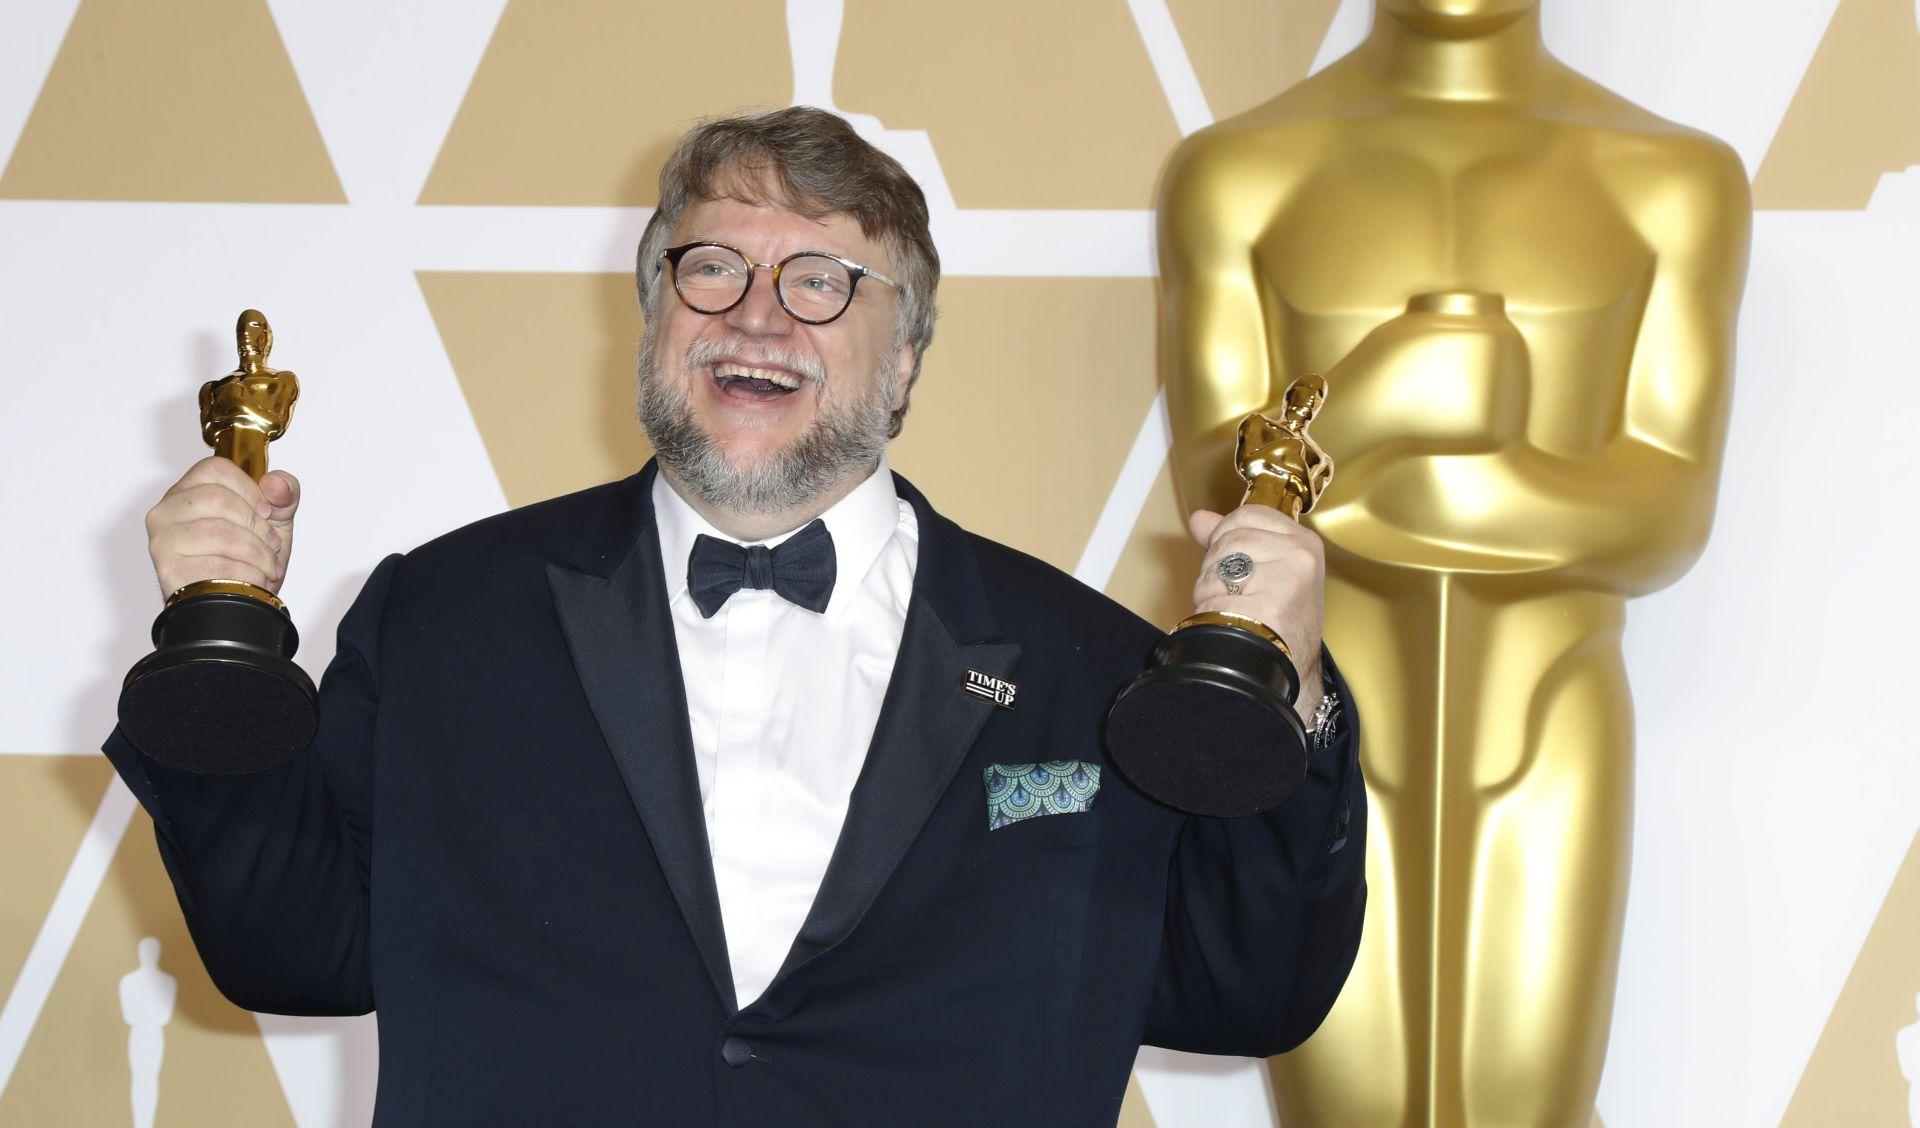 Vraća se osvajač Oscara Guillermo del Toro i to sa dva filma istovremeno